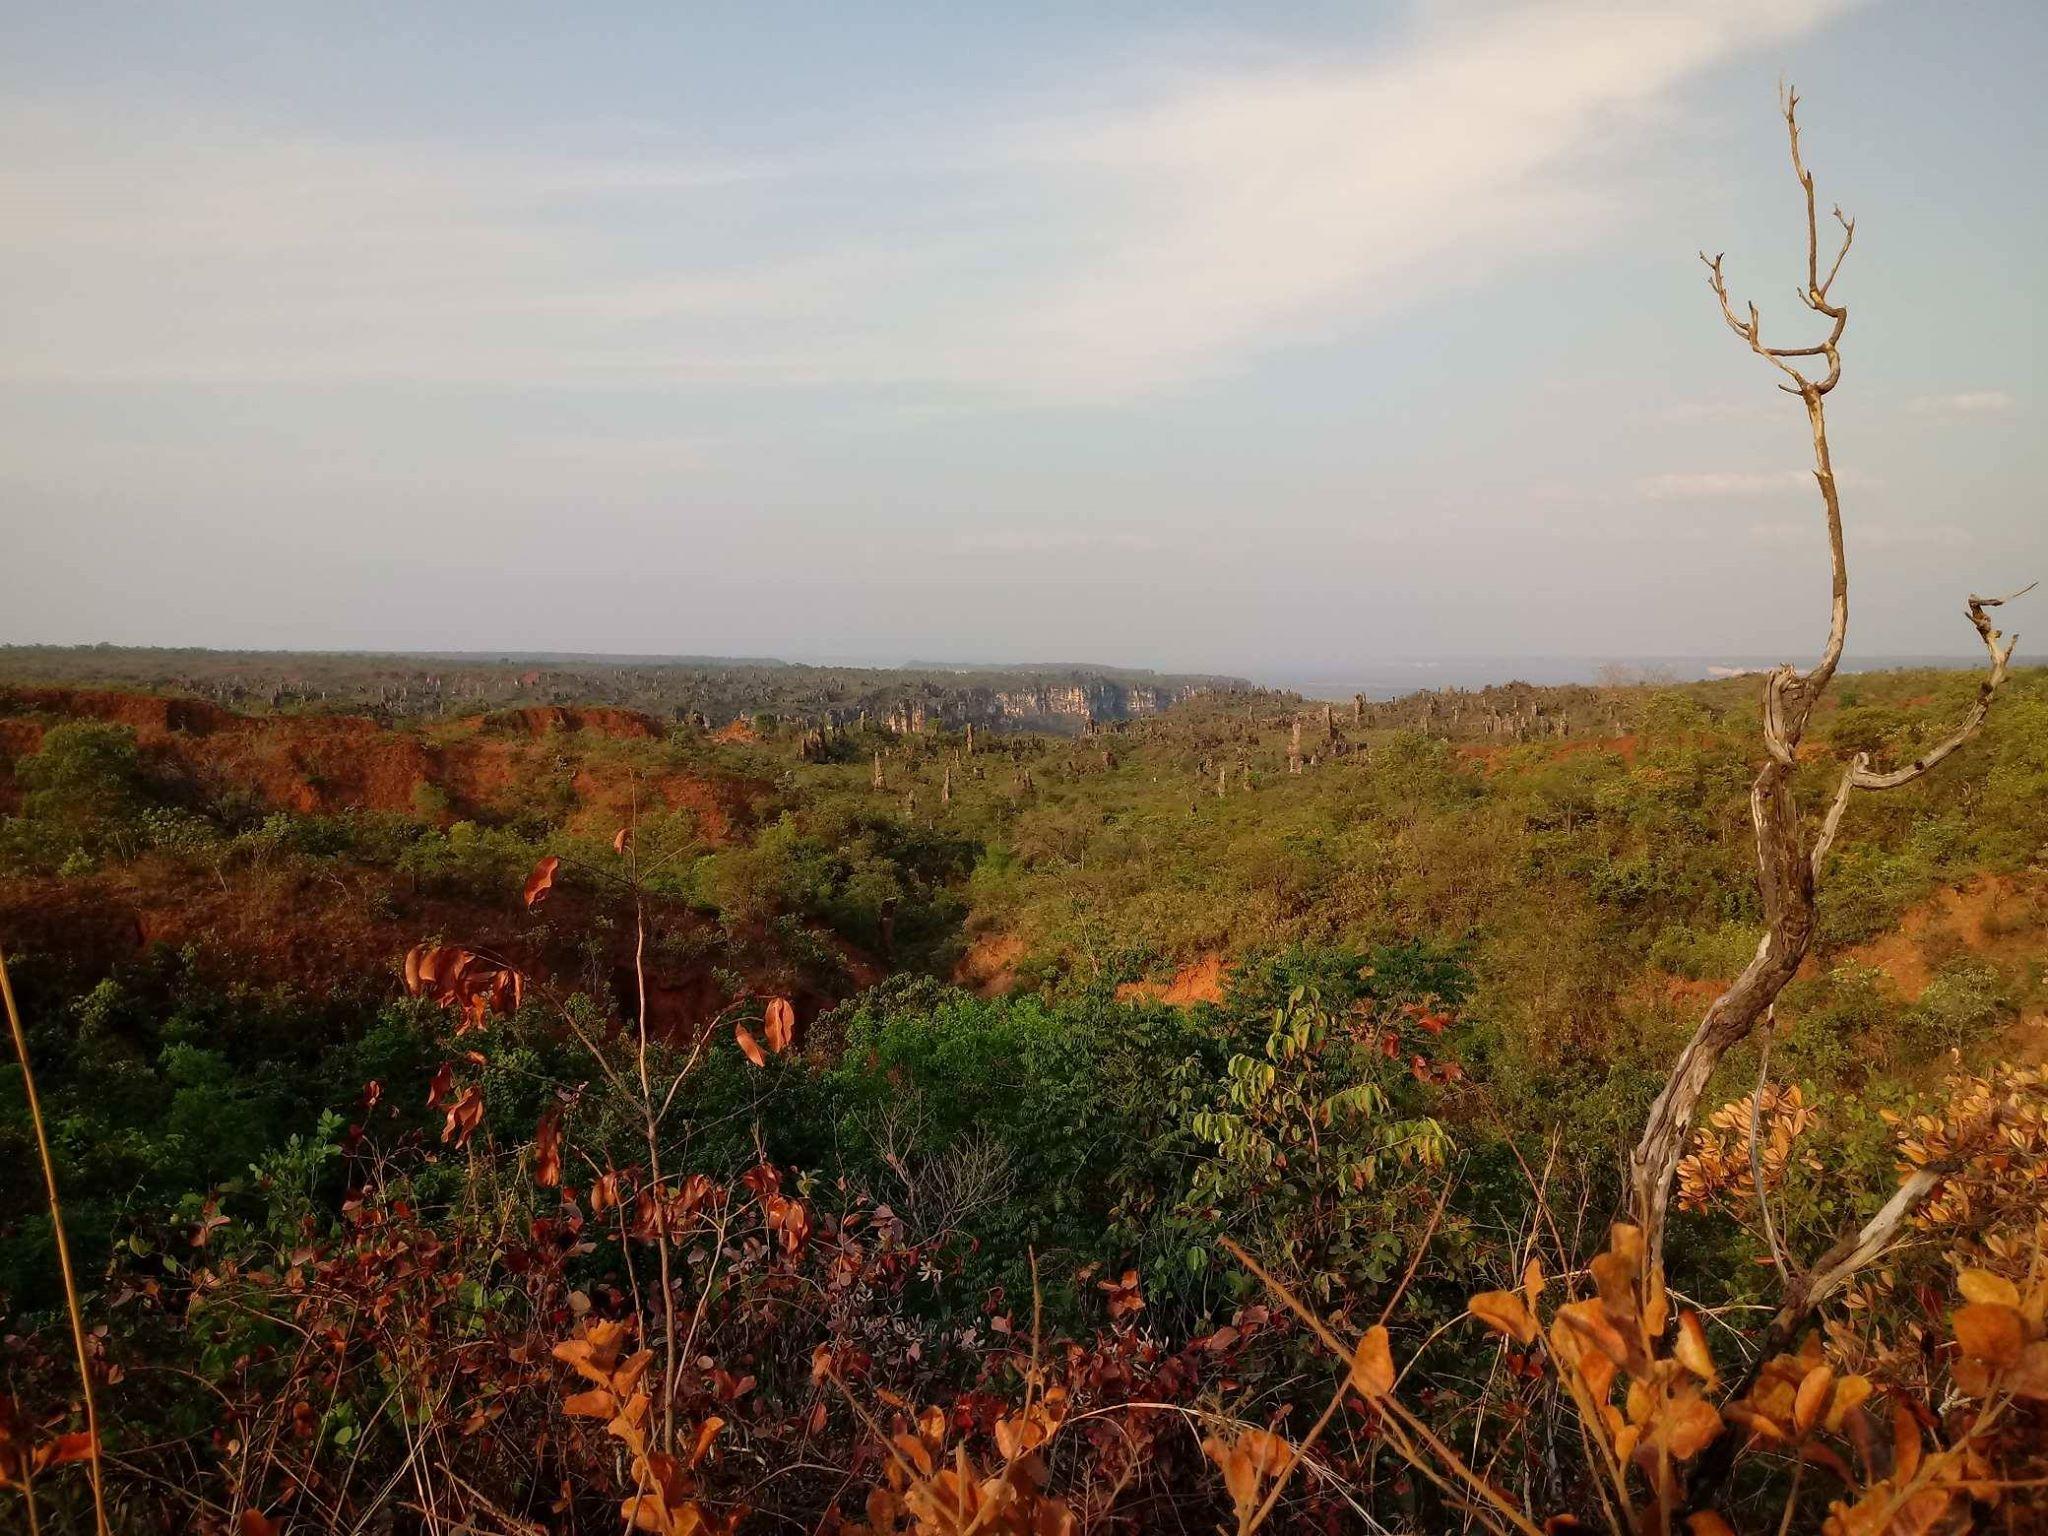 28-9-2018-Caynion-Jalapao-National-park-31[1]